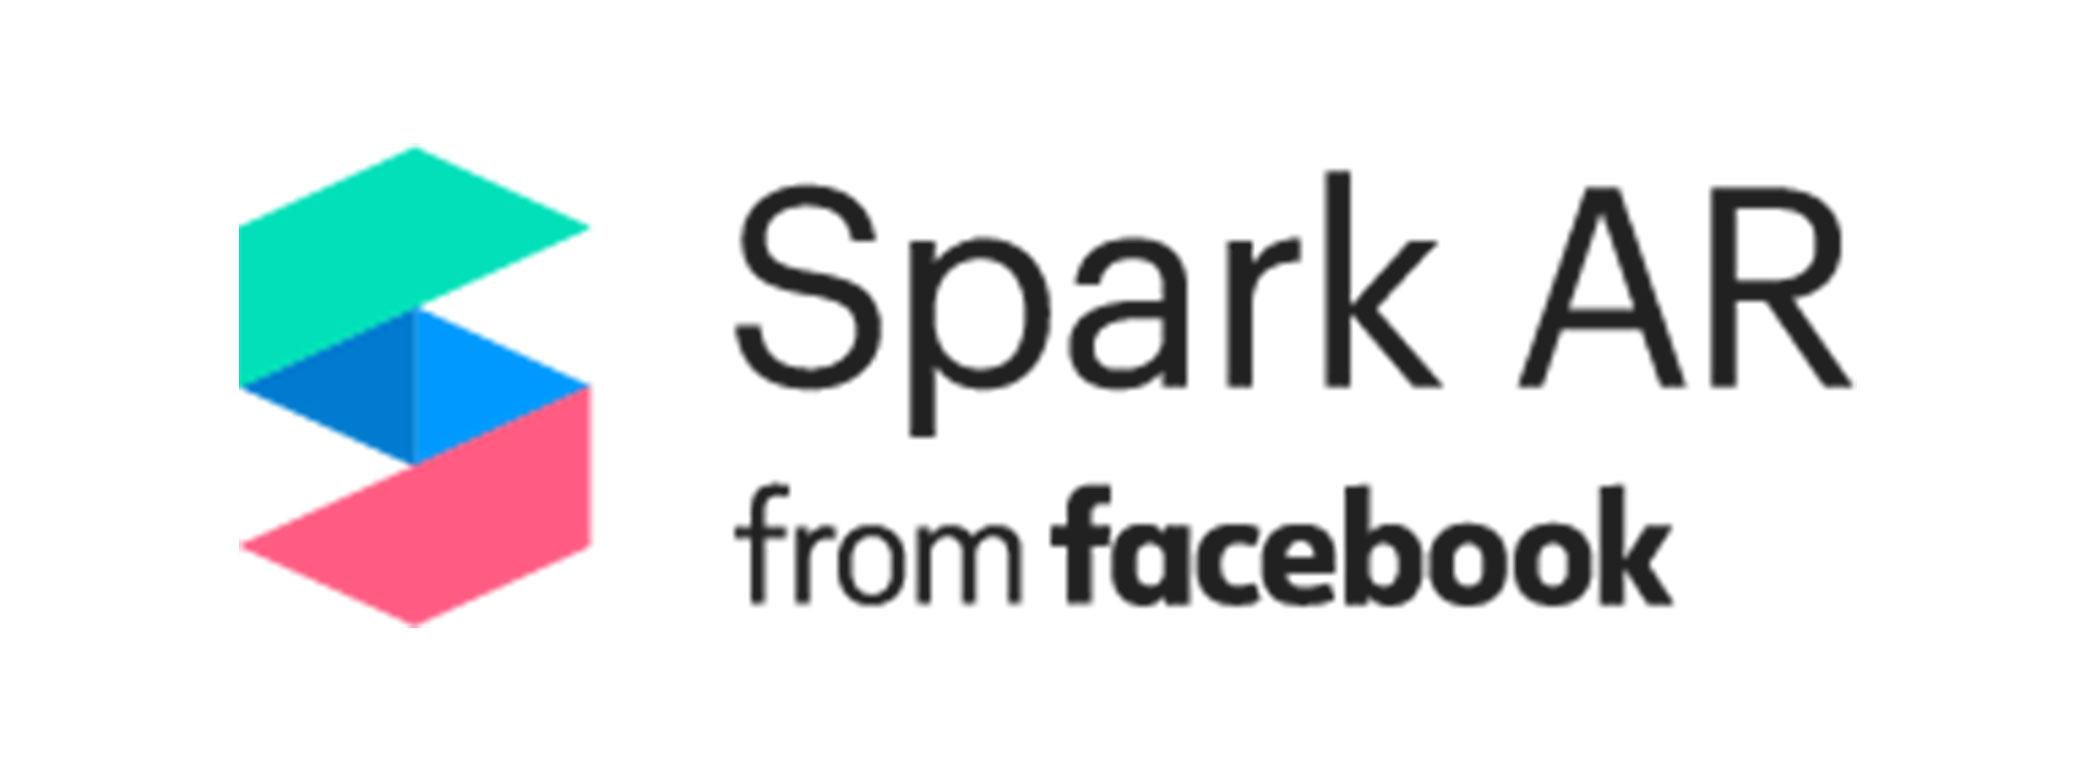 Facebook Spark